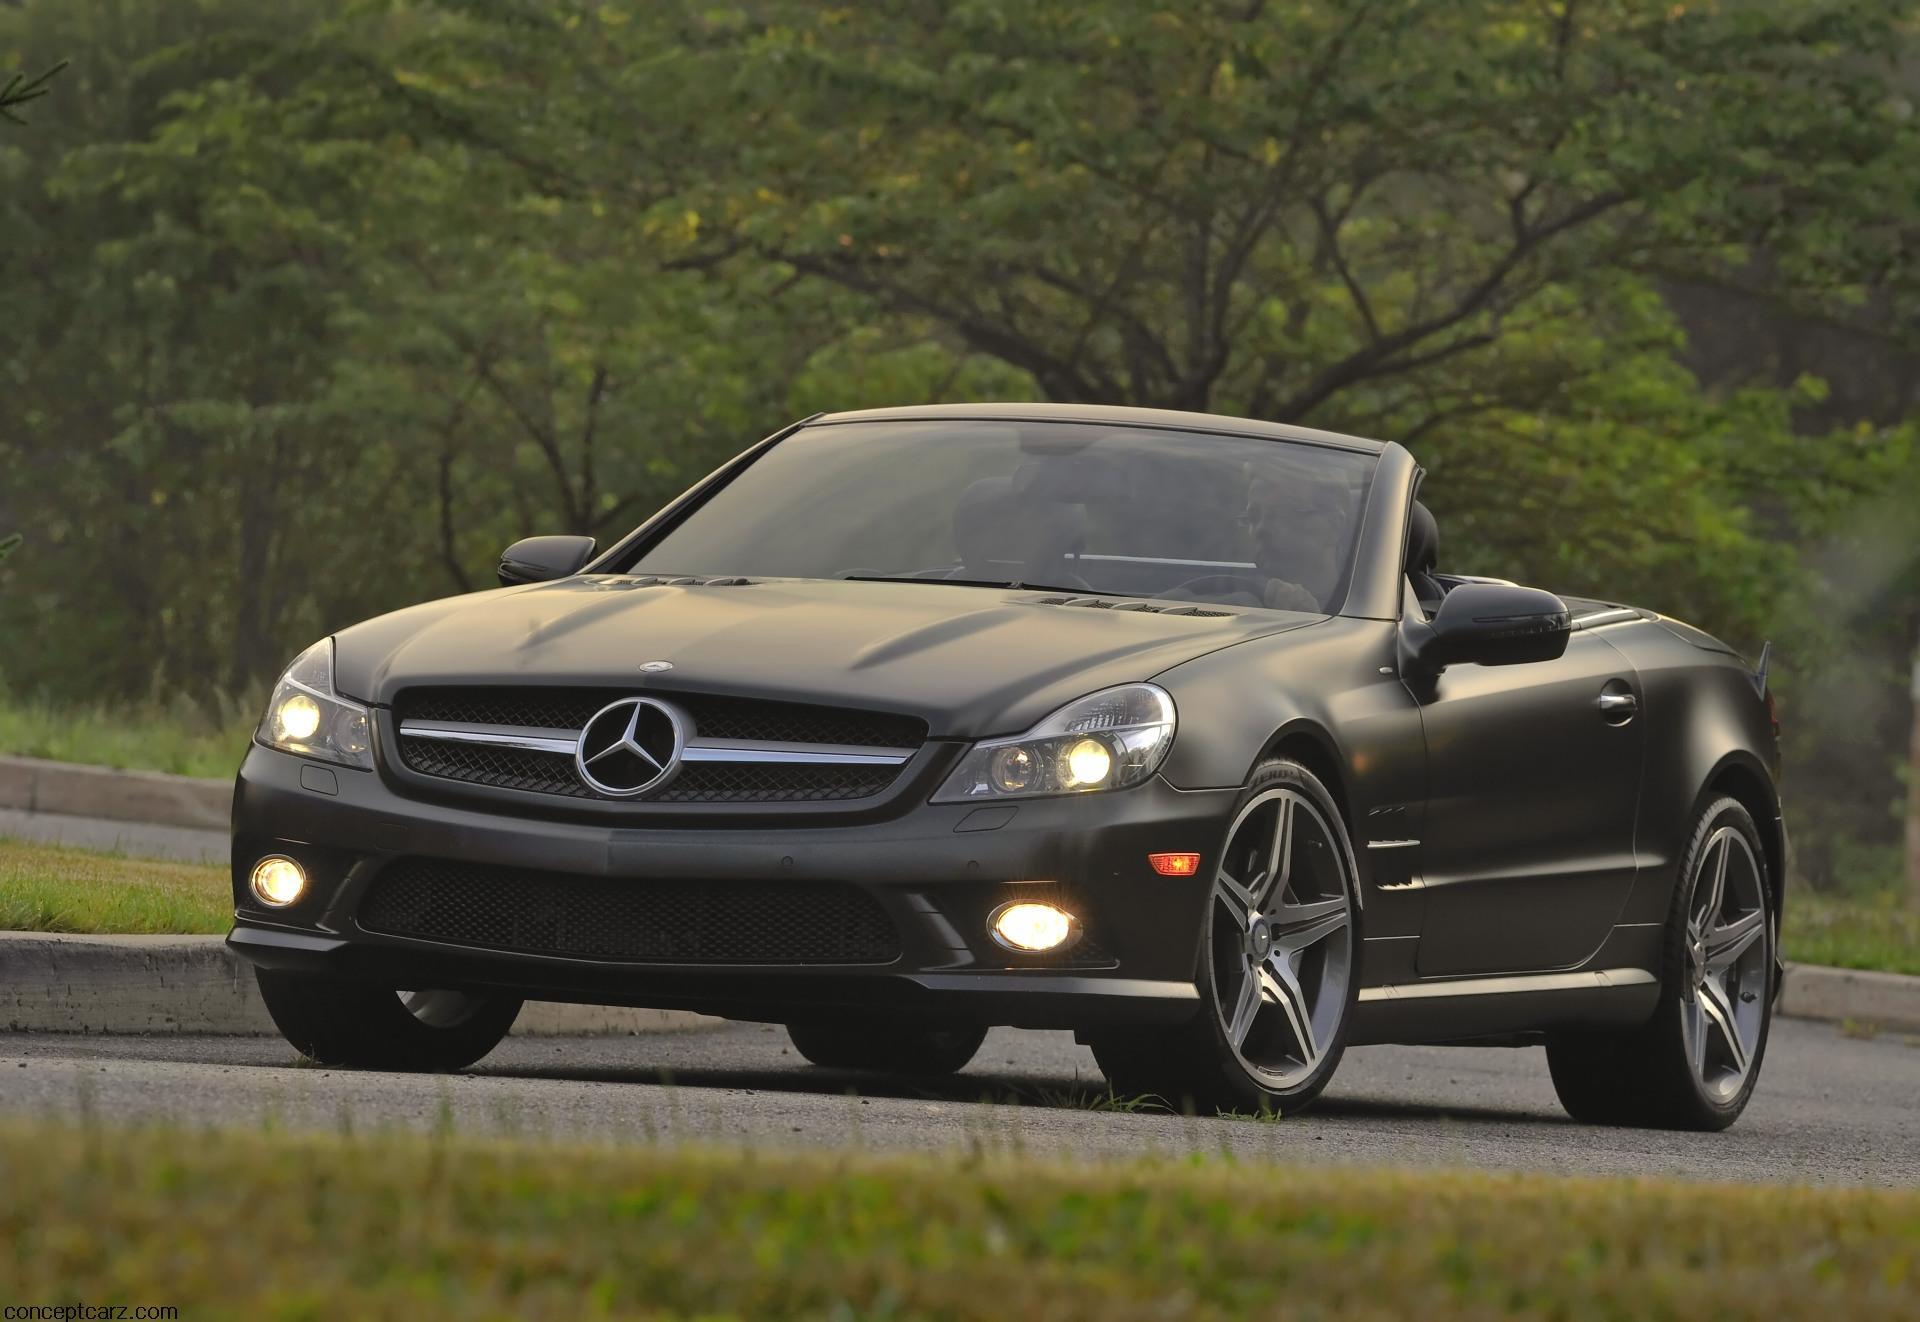 2011 Mercedes-Benz SL550 Night Edition